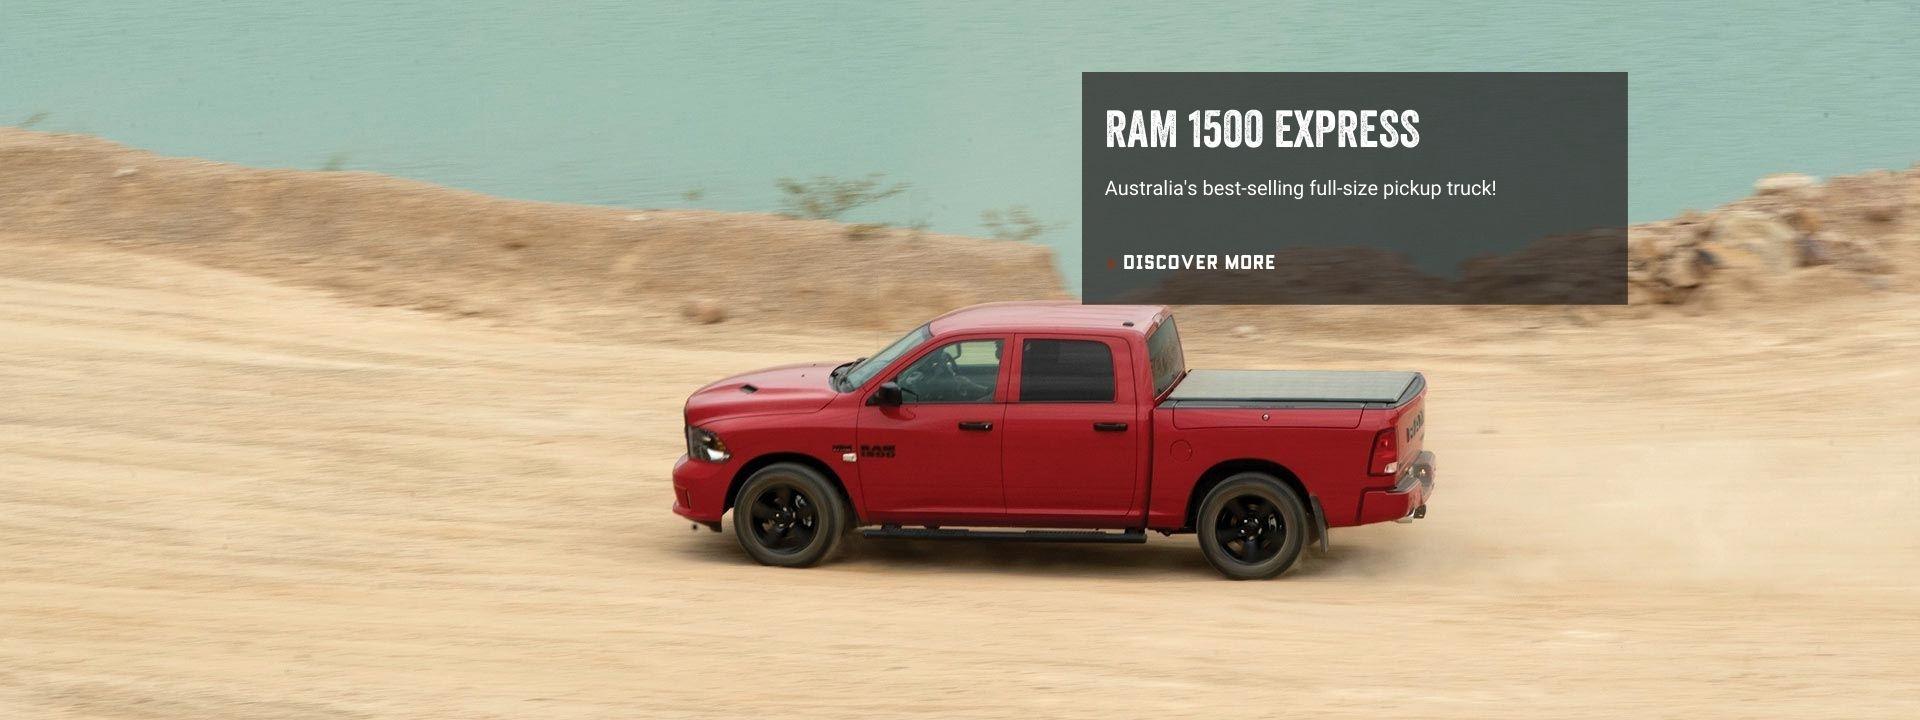 New Ram 1500 Express Crew Cab. Book a Test Drive.